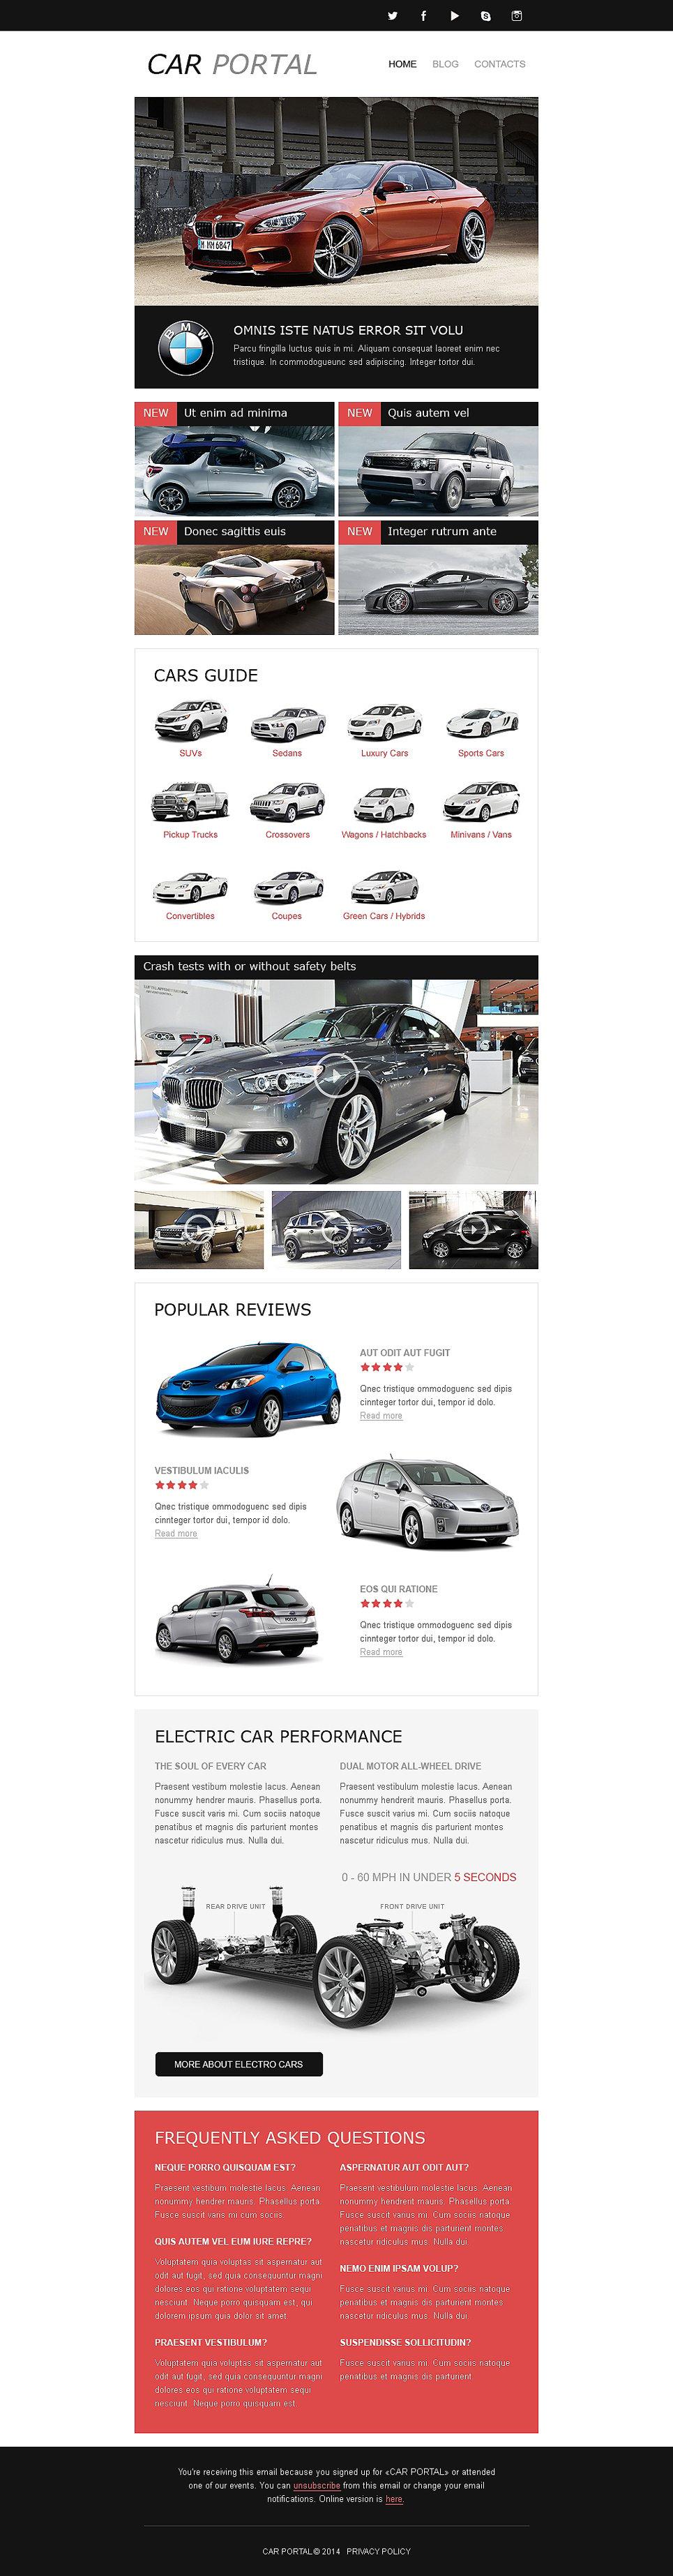 car club responsive newsletter template #50679